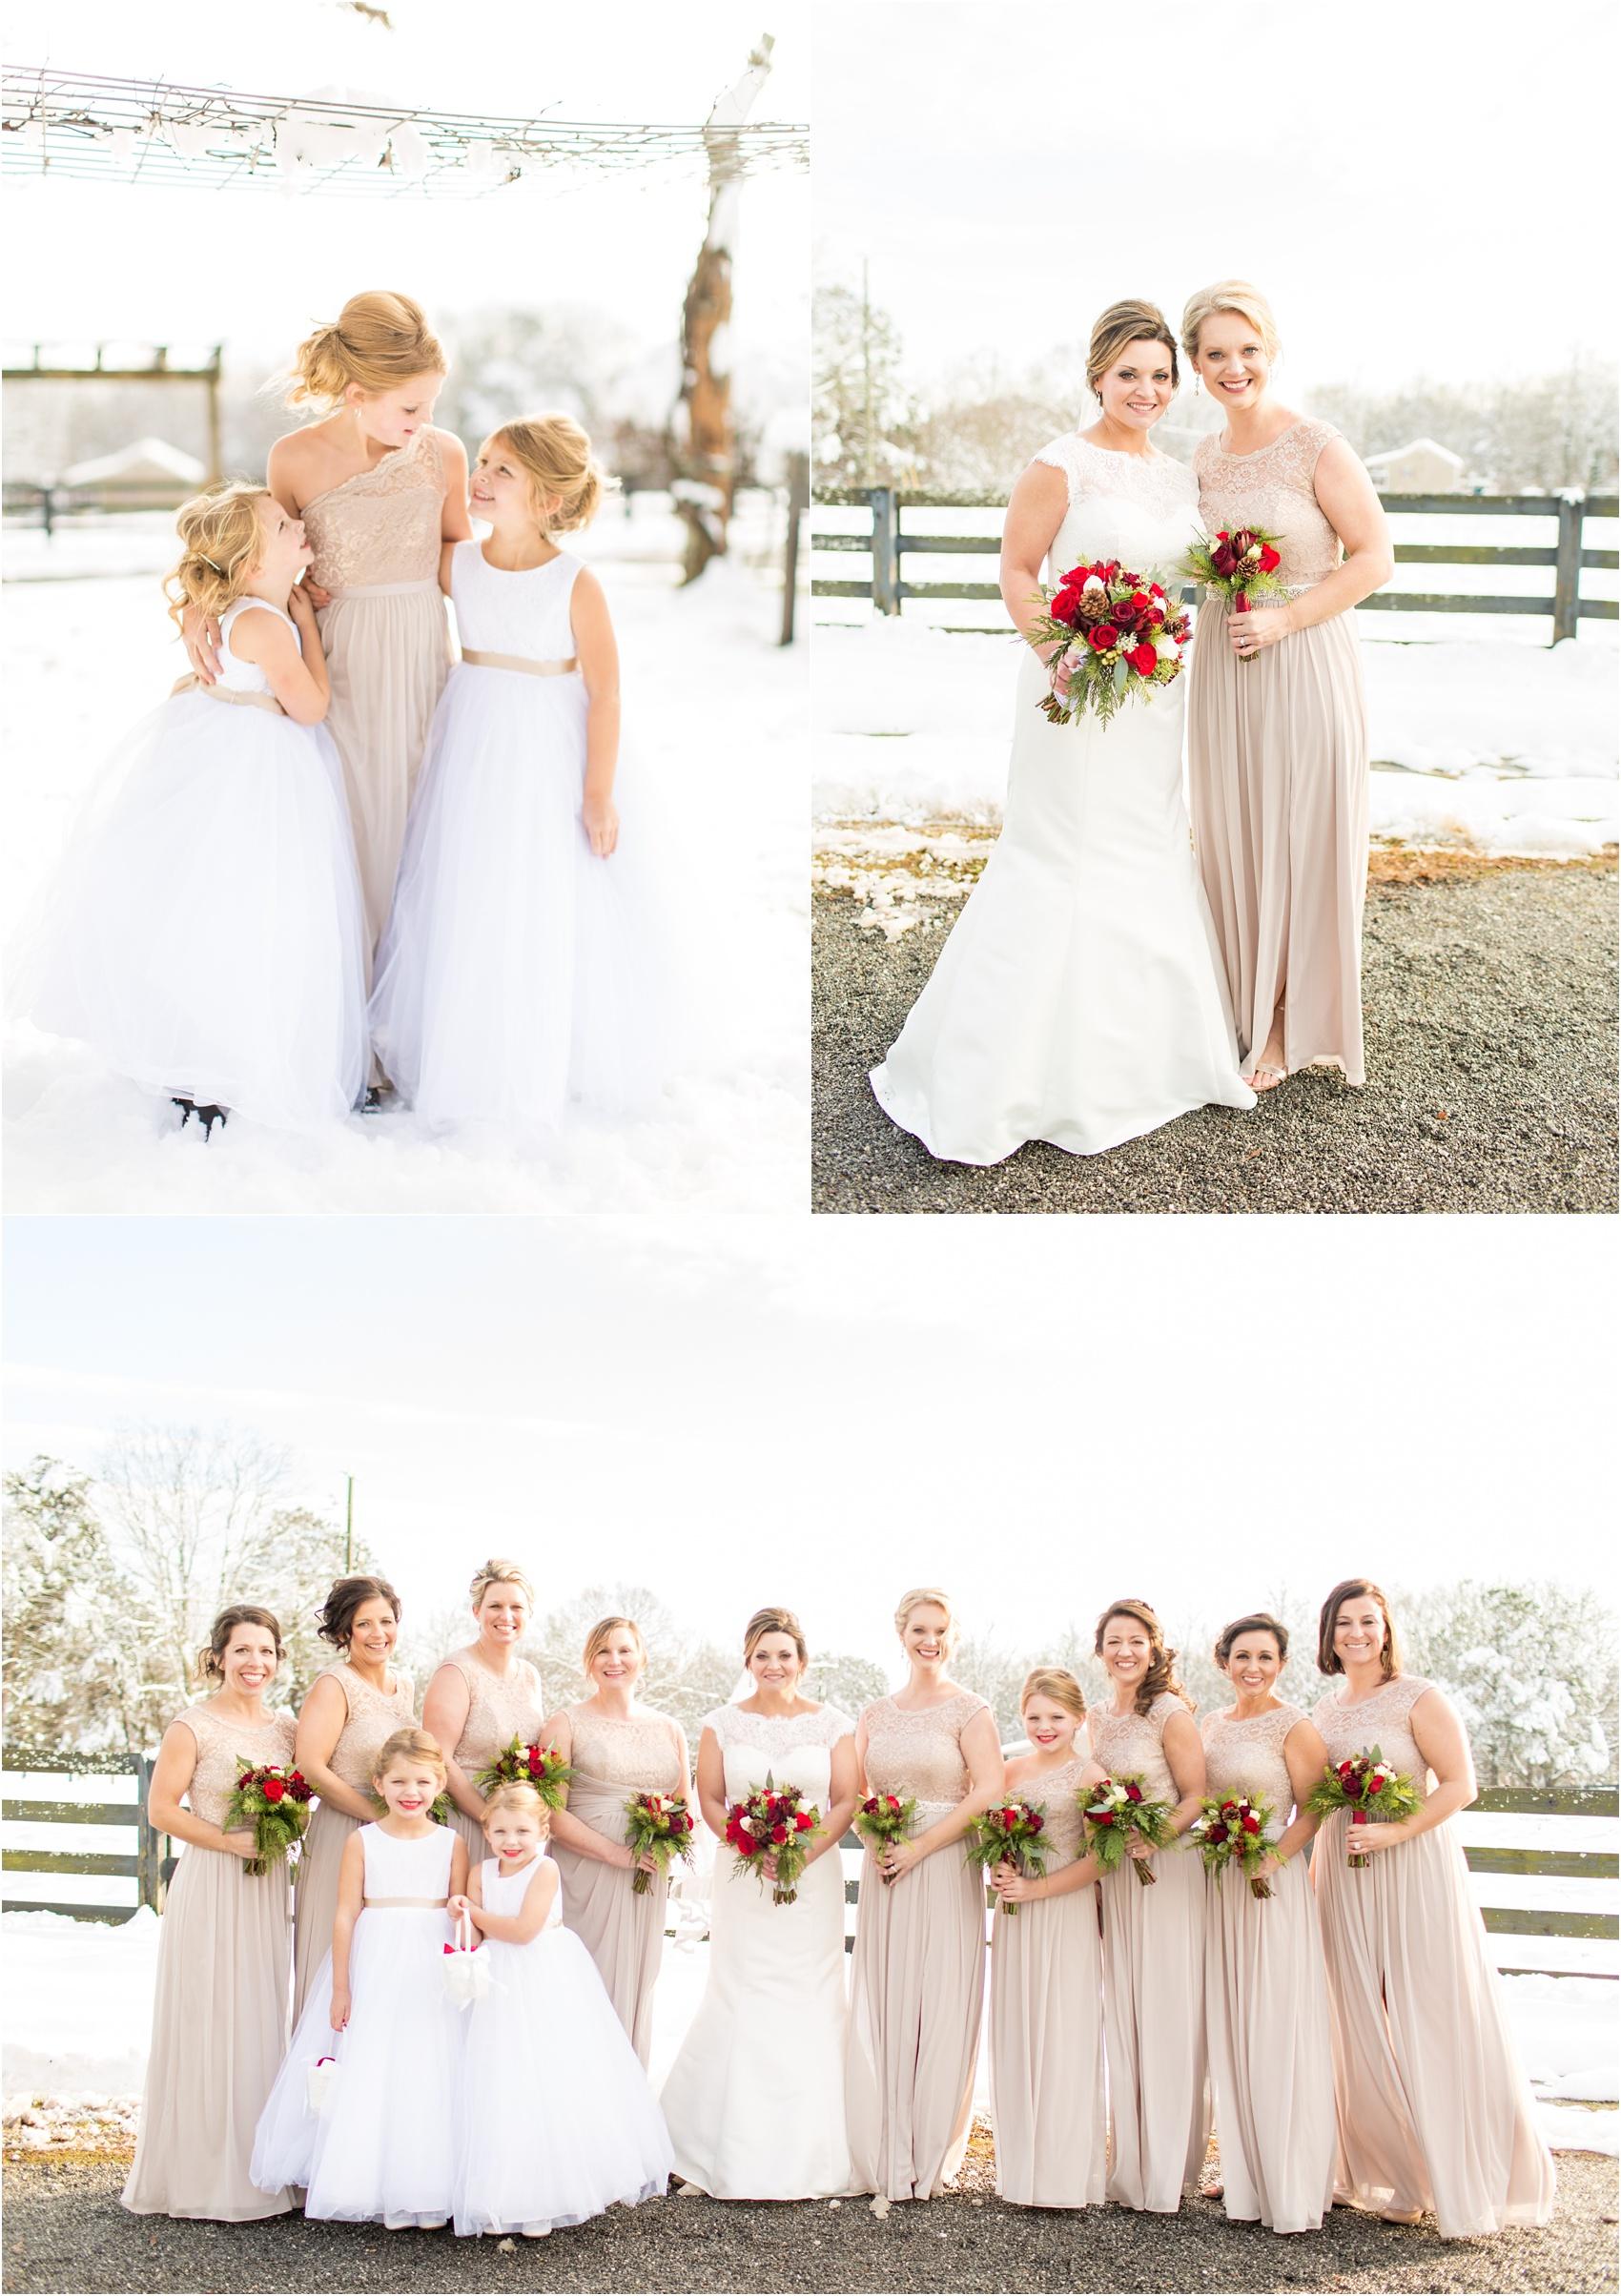 Savannah Eve Photography- Page Wedding Blog-14.jpg